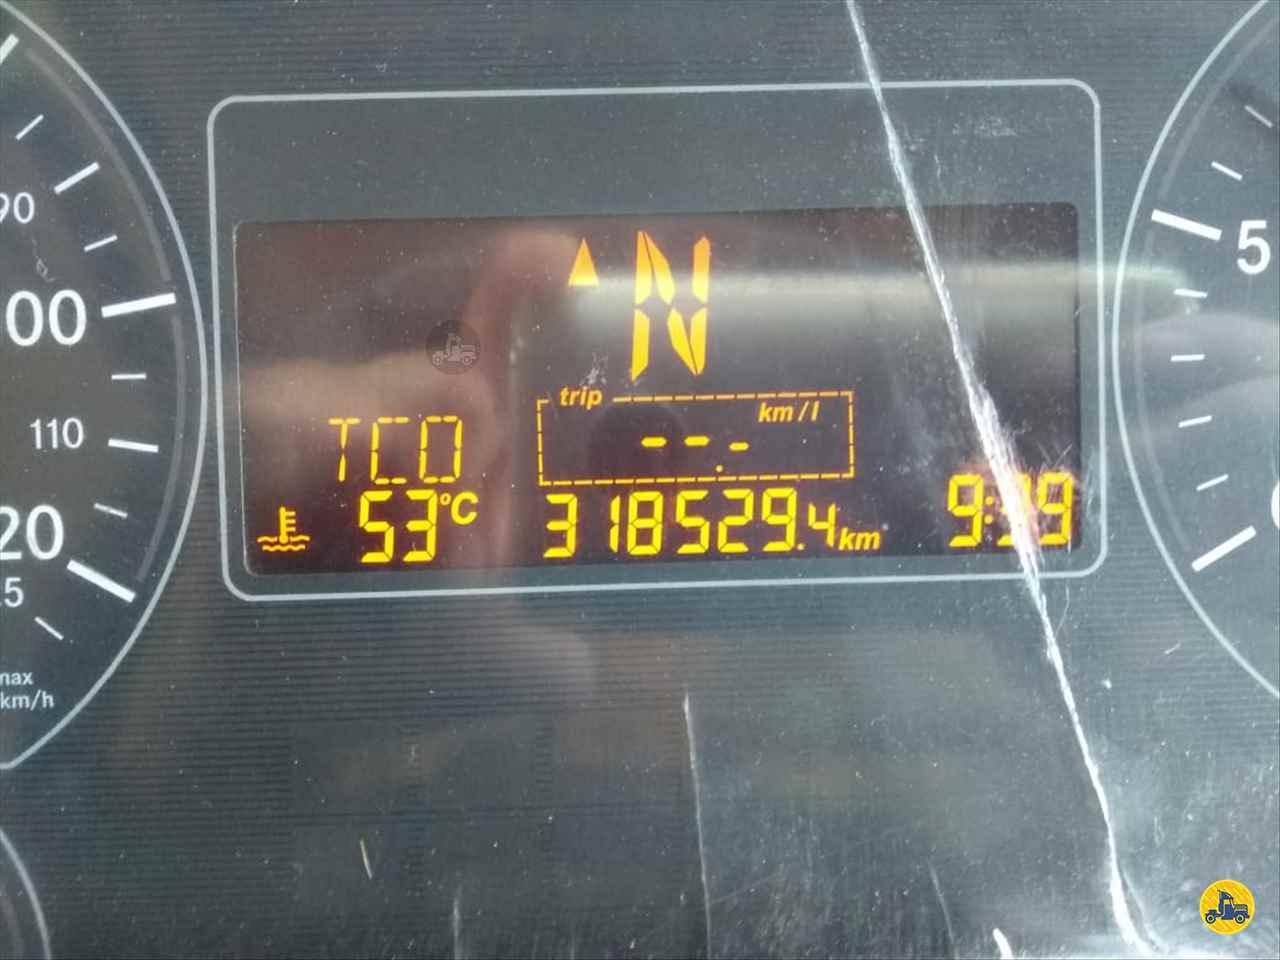 MERCEDES-BENZ MB 1719 318000km 2013/2013 DKM Caminhões